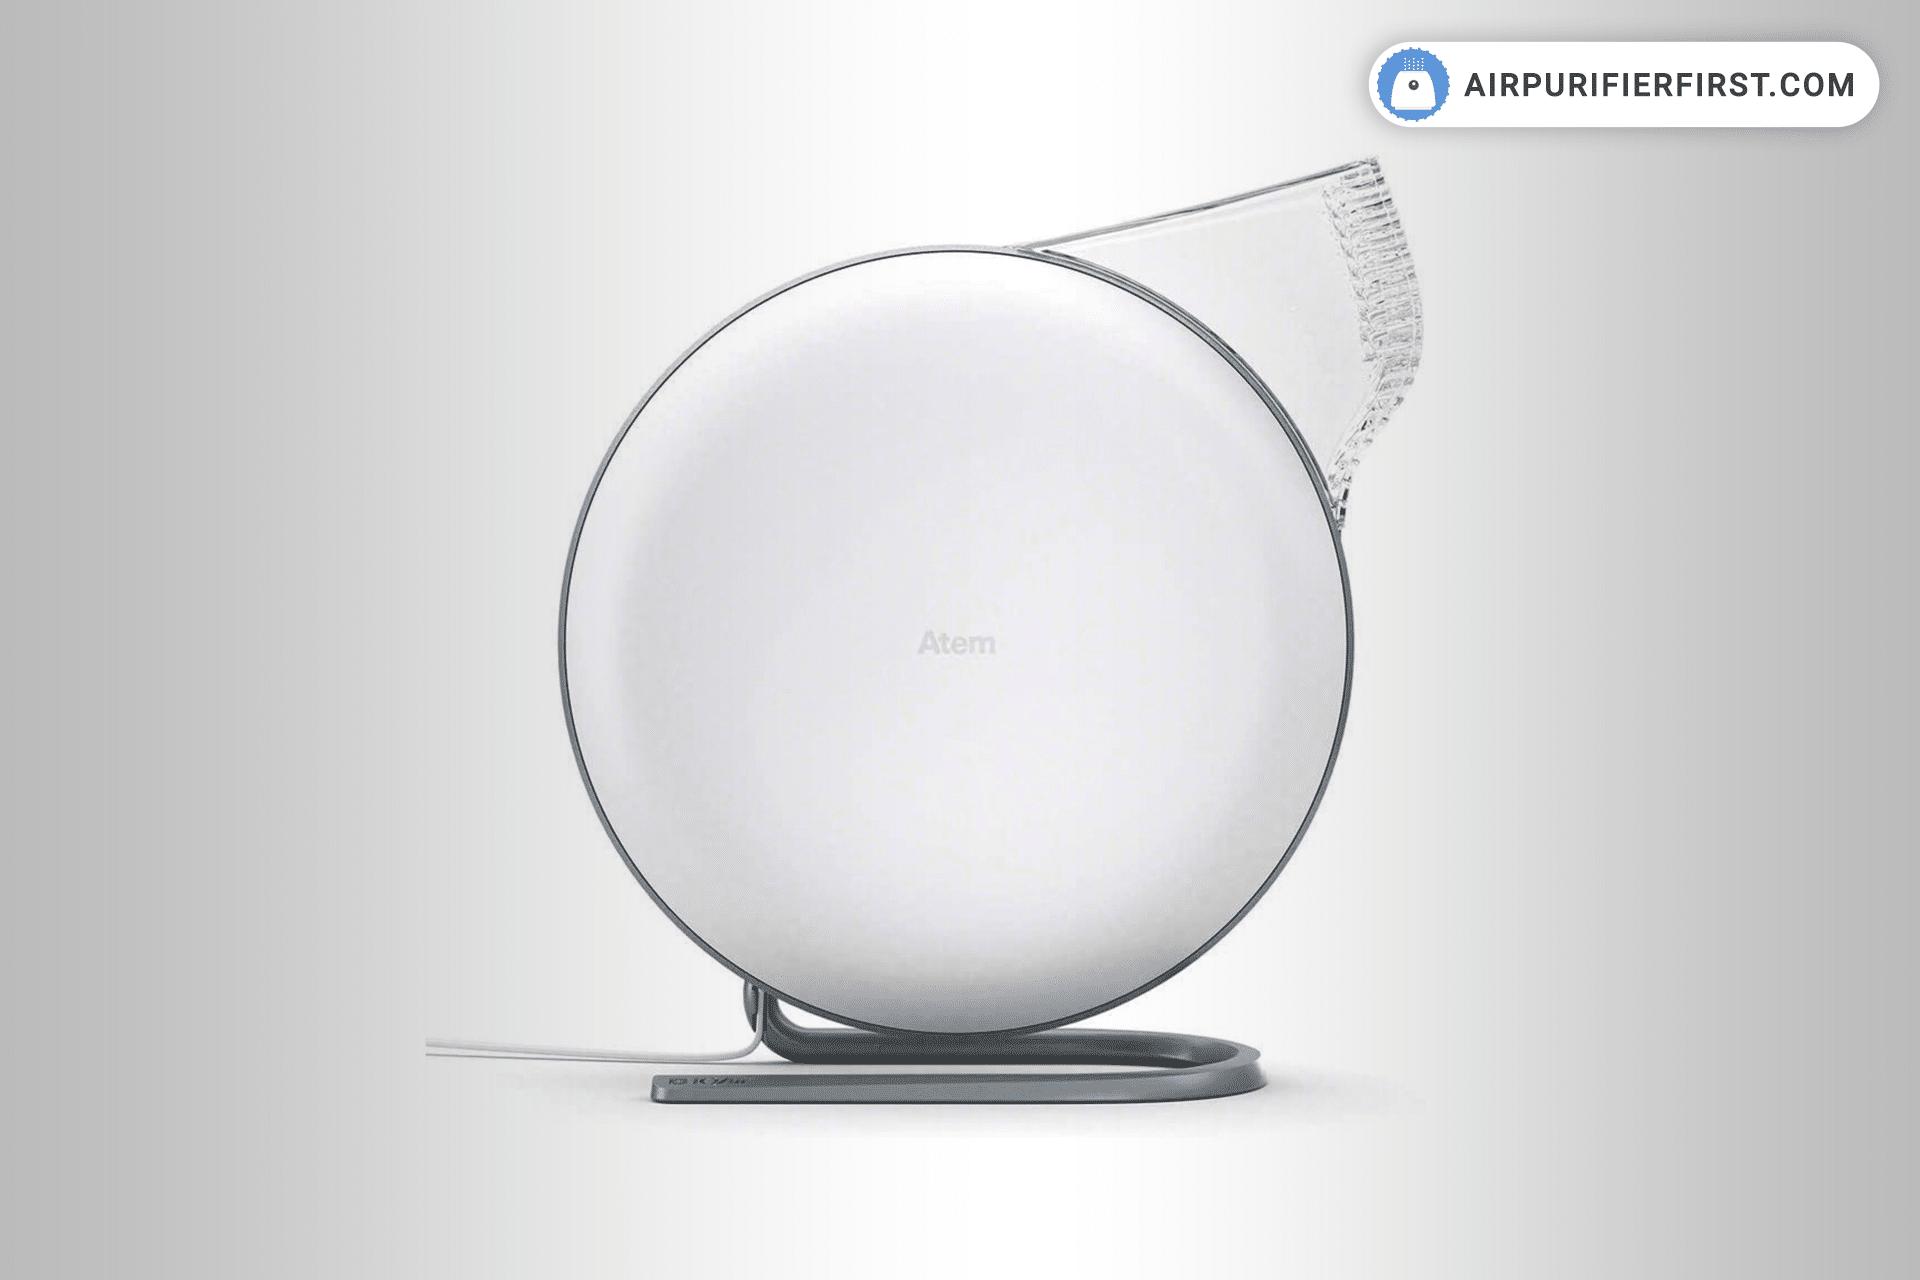 IQAir Atem Air Purifier - Best Desktop Air Purifiers